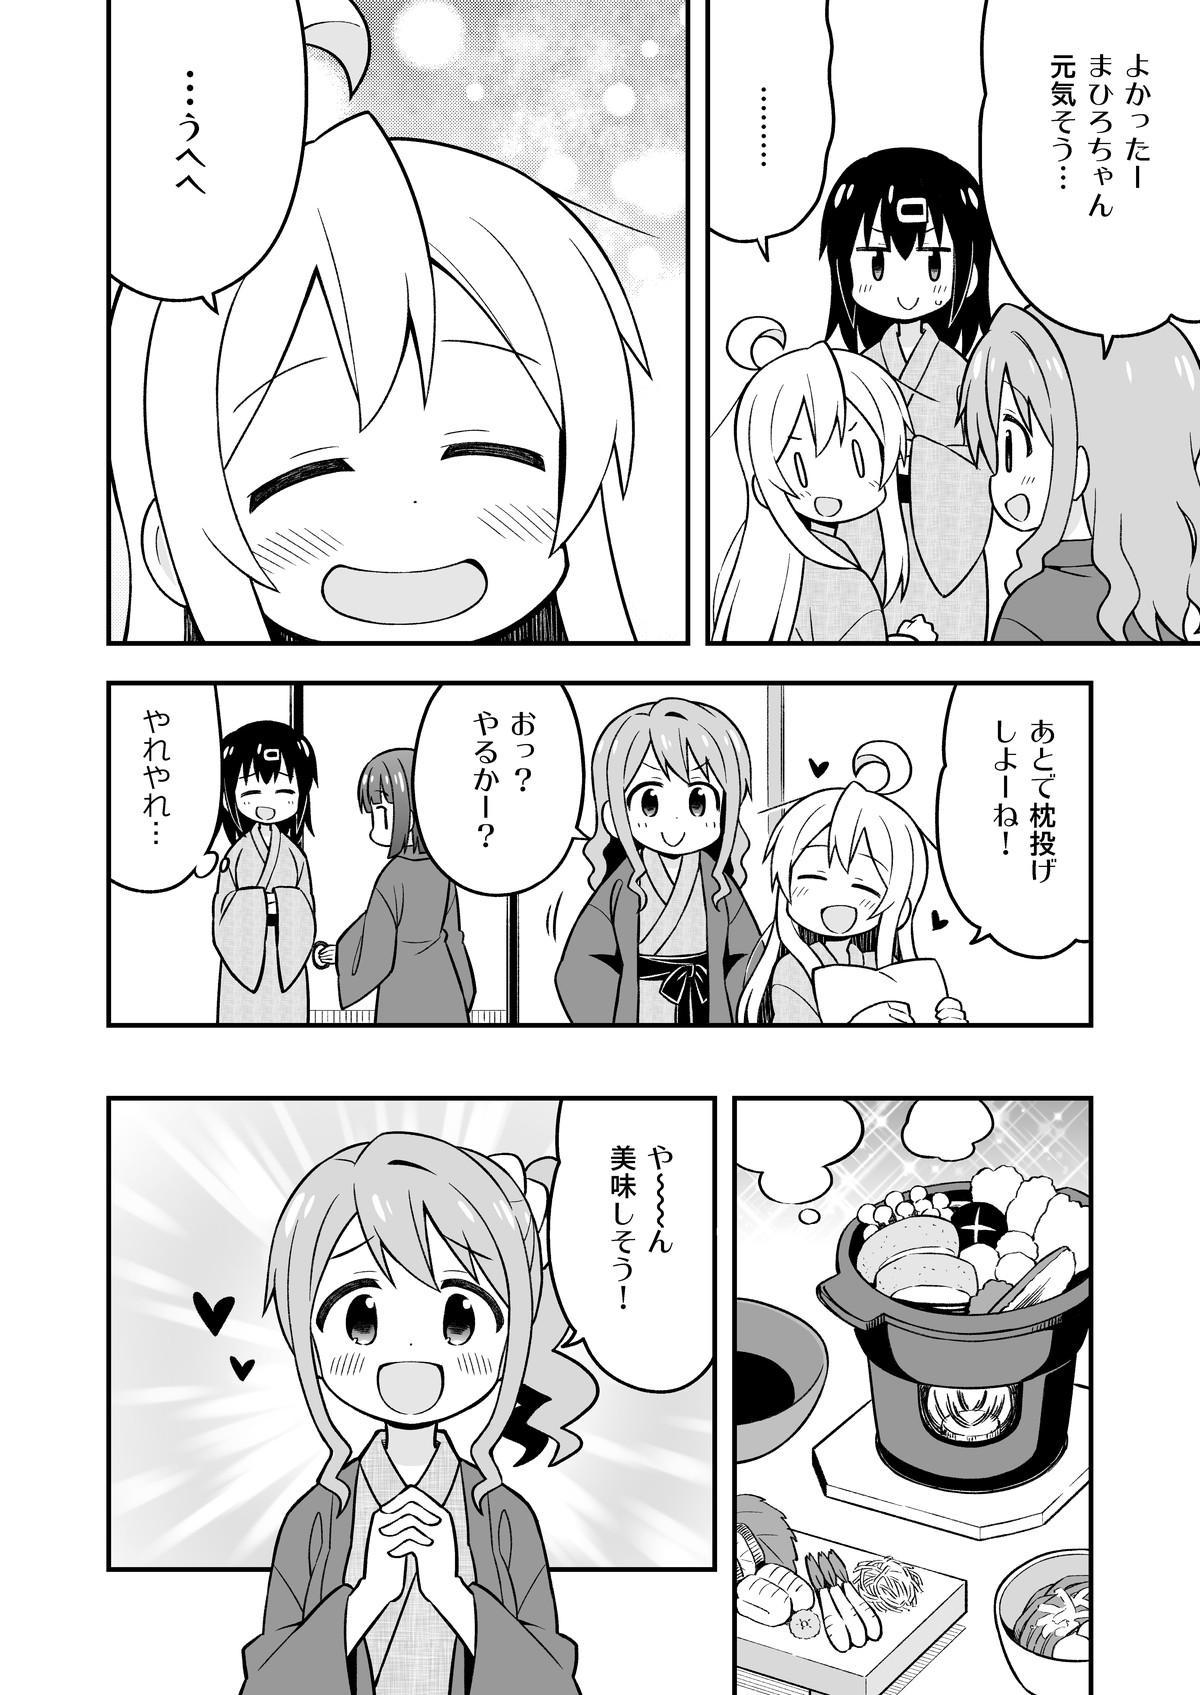 Onii-chan wa Oshimai! 6 36